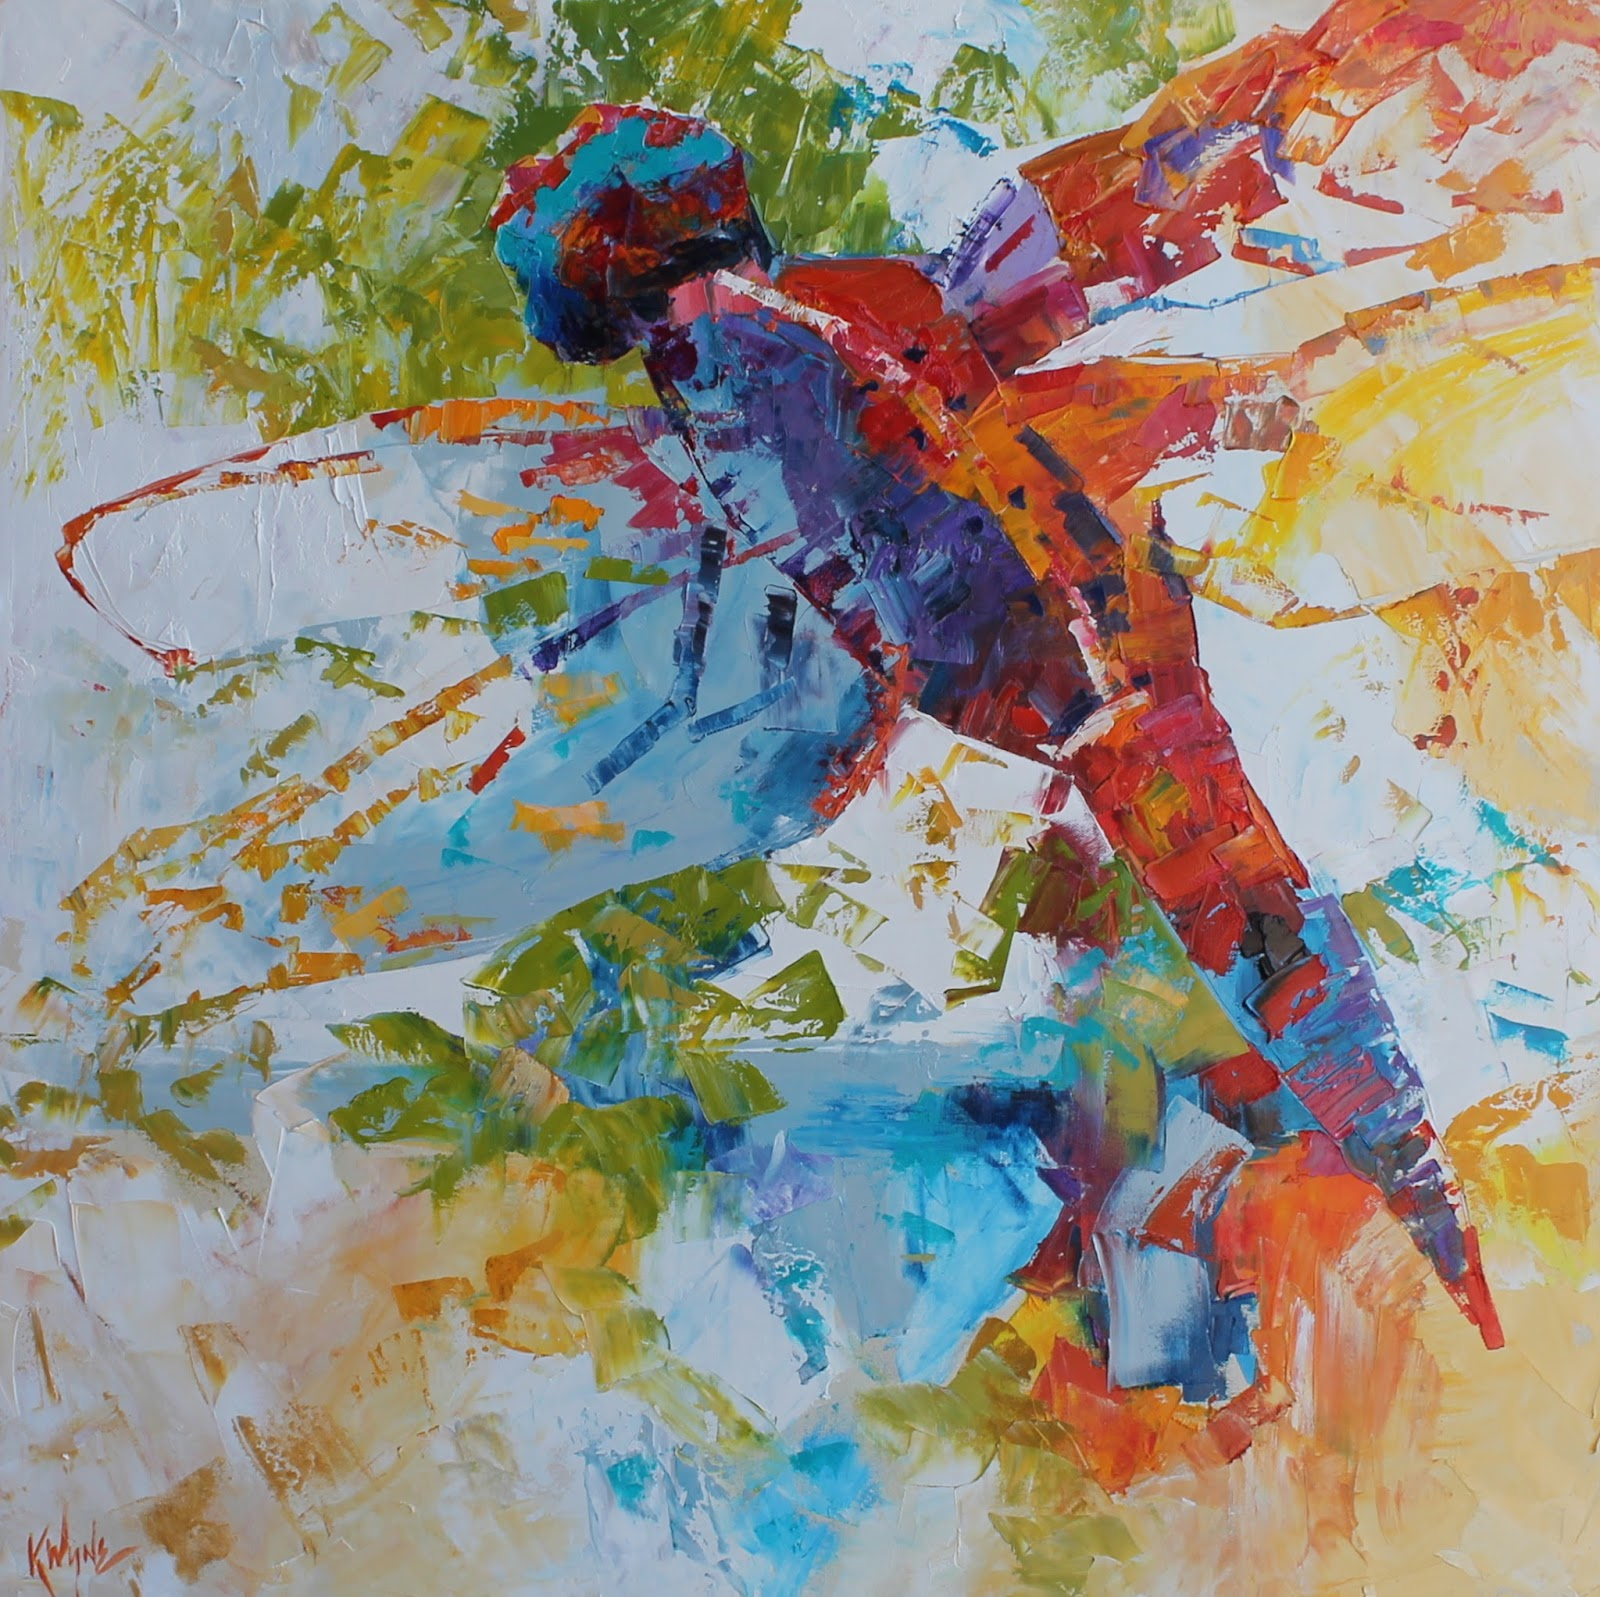 Kay Wyne Fine Art Blog: Red Dragonfly - Sold